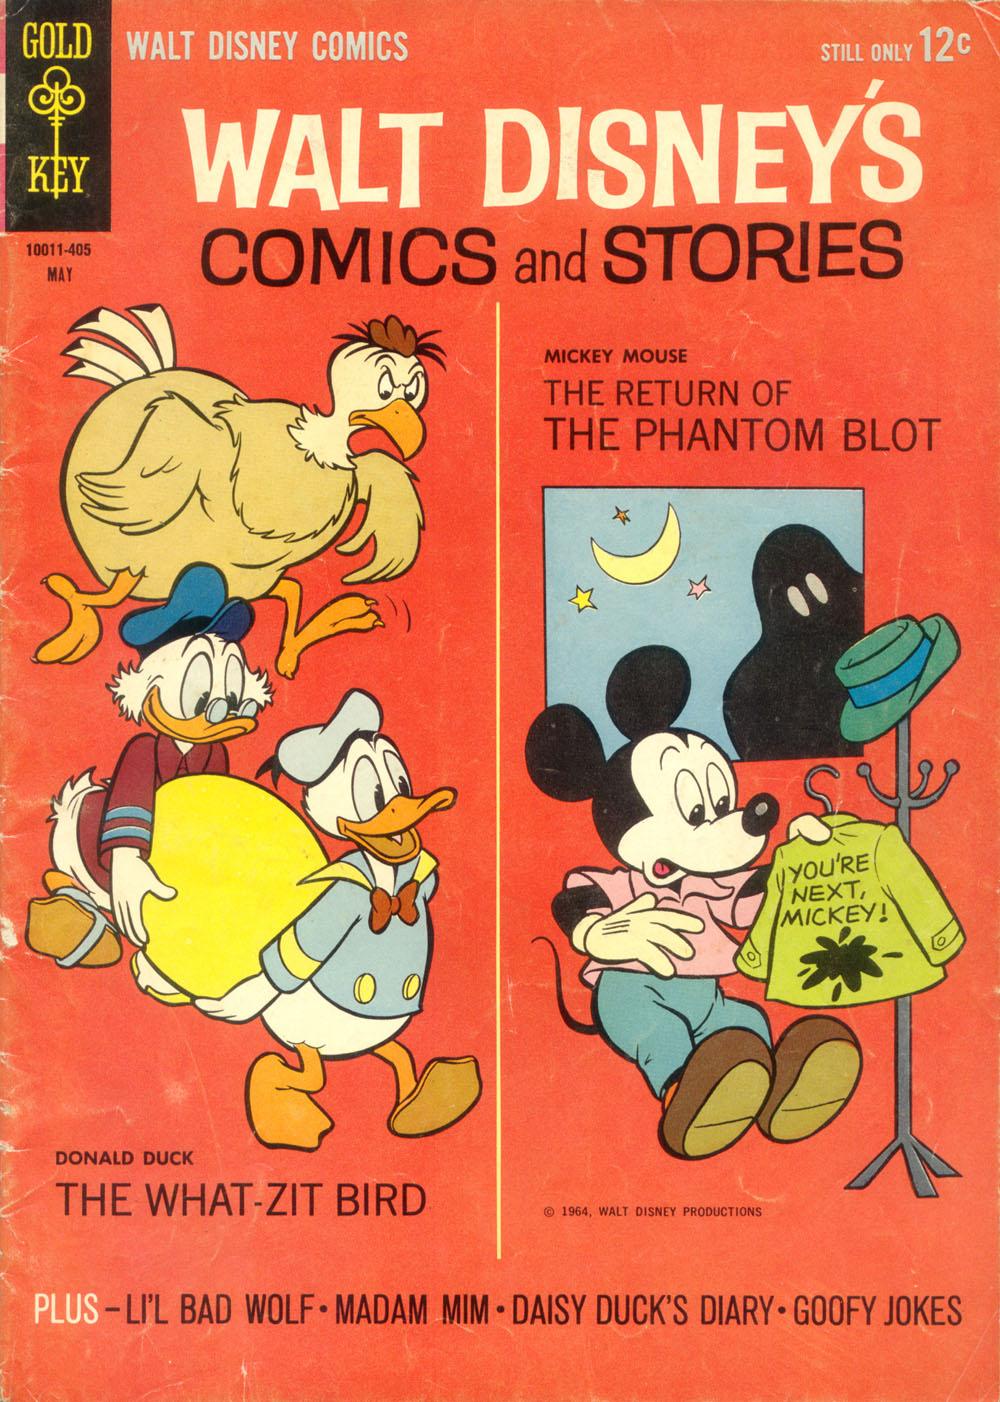 Walt Disneys Comics and Stories 284 Page 1